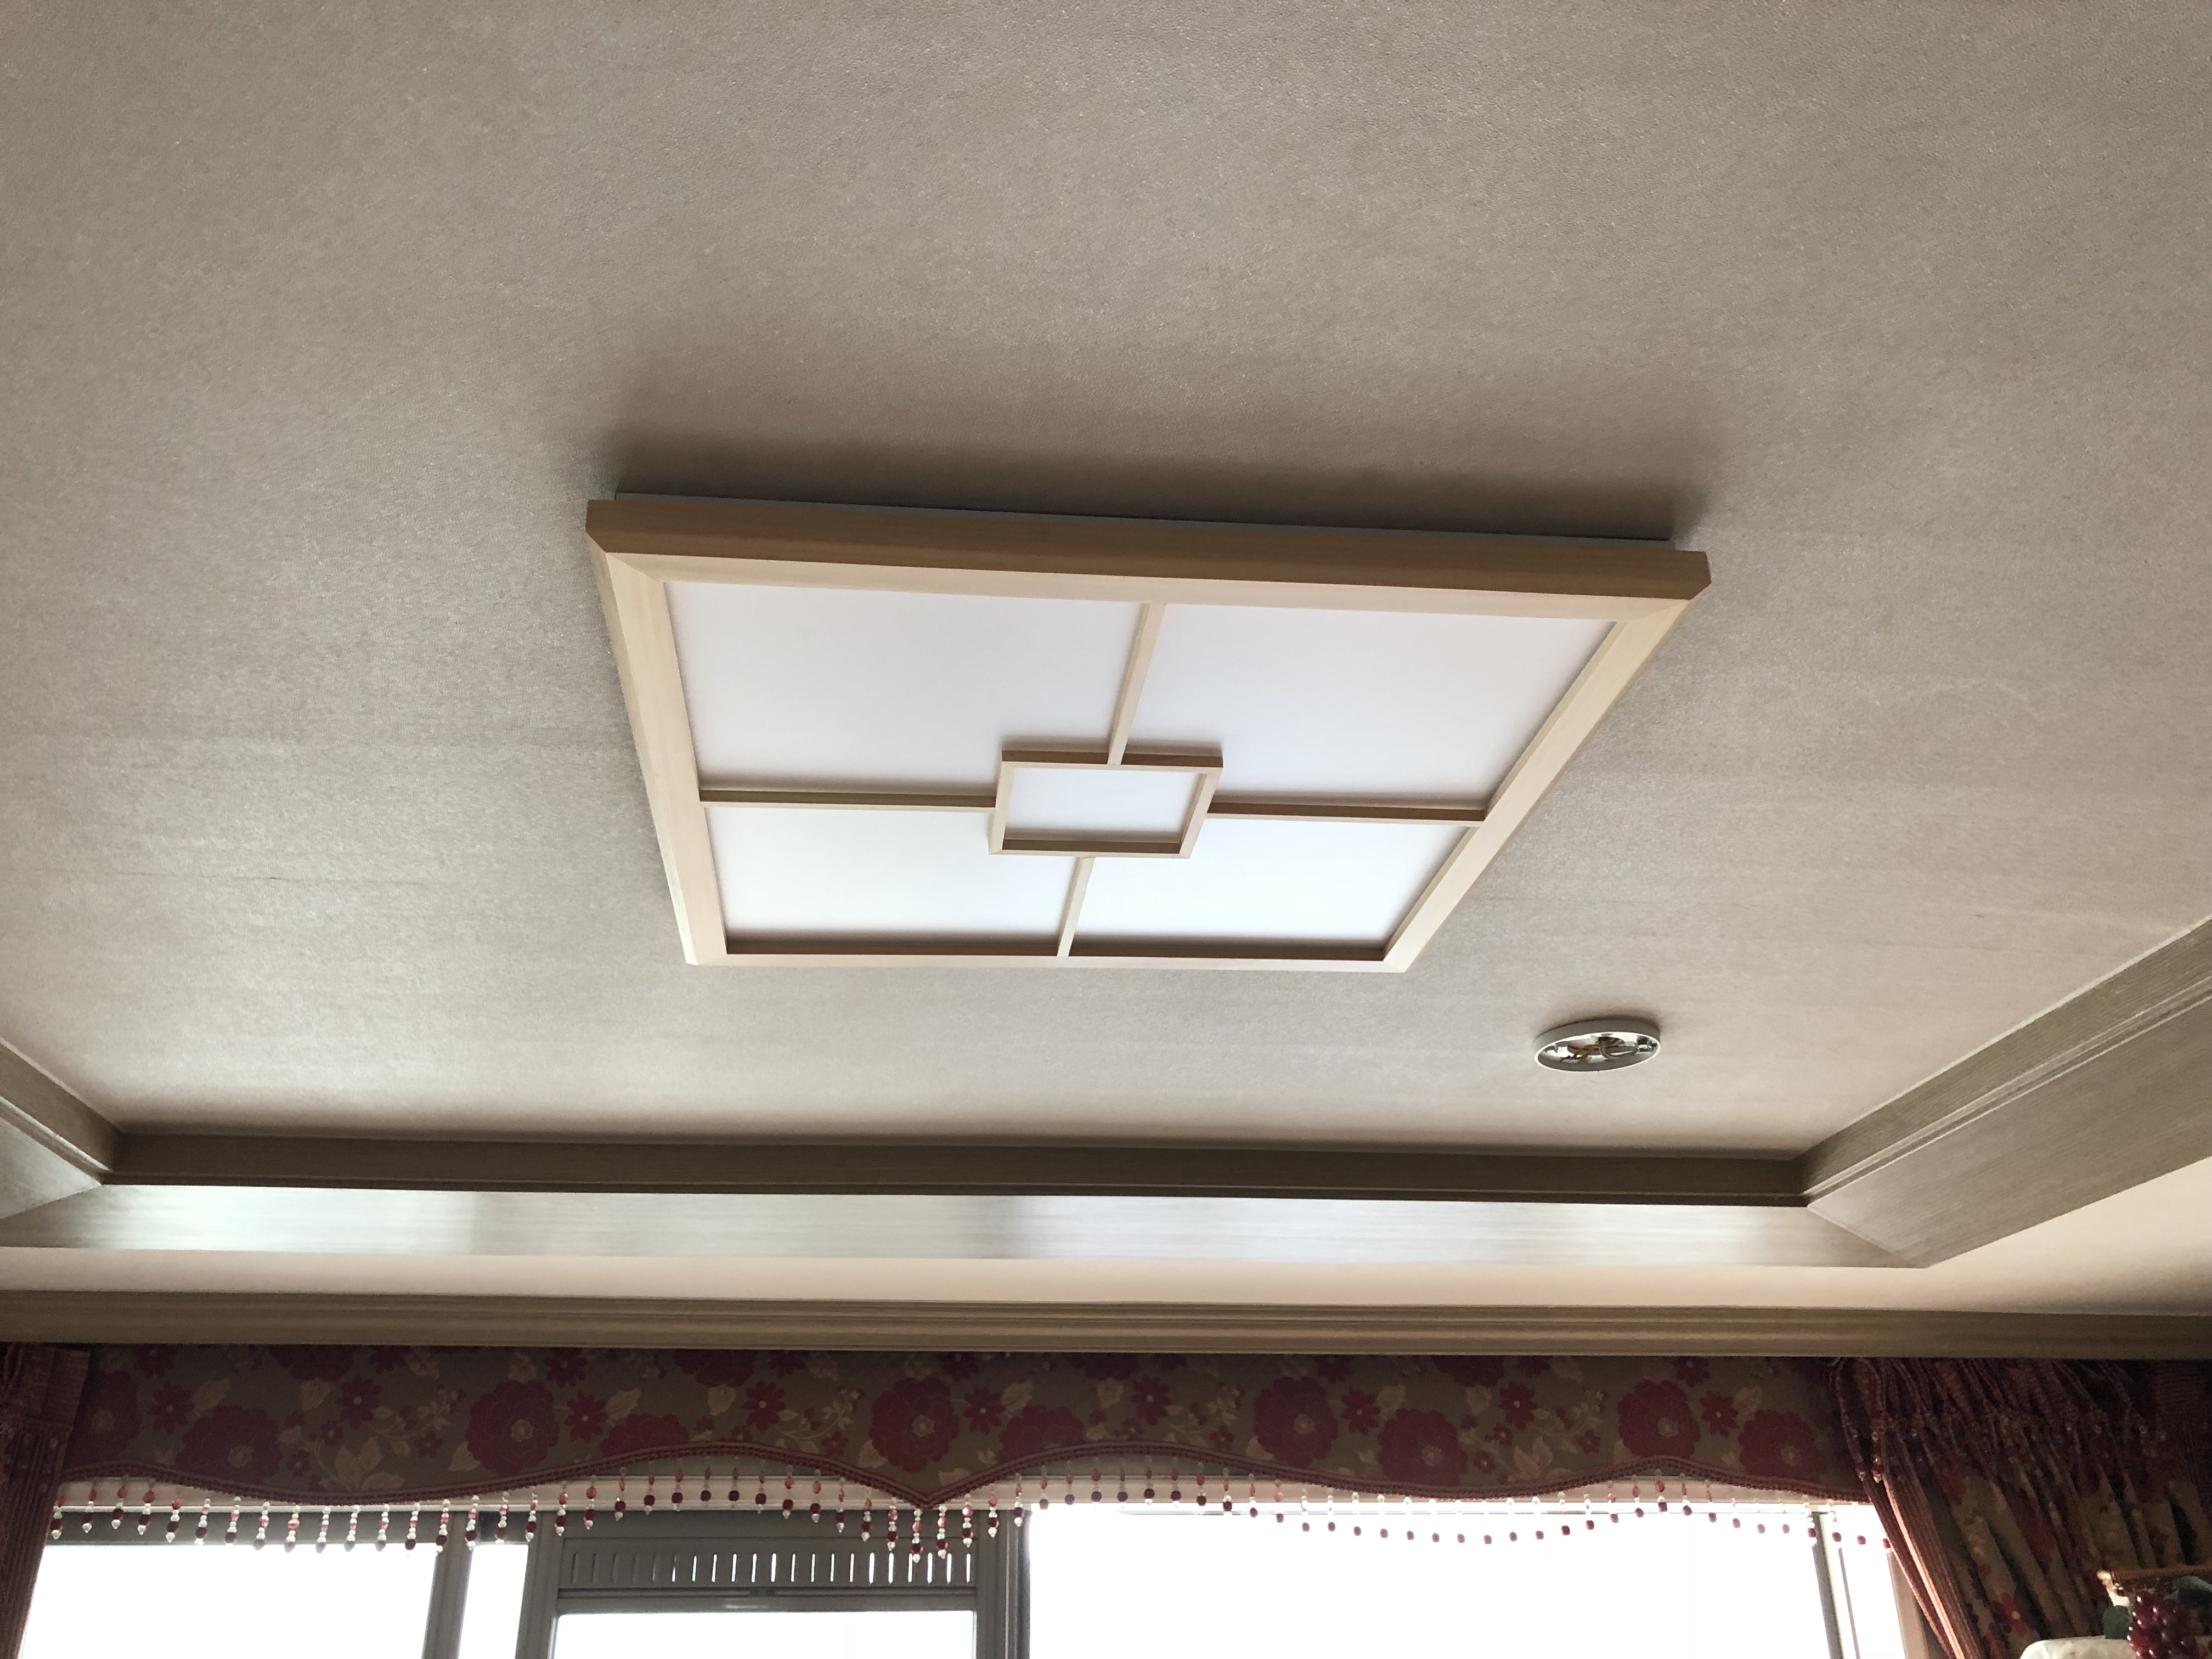 LED방등 편백사각방등 50w - 조명천지, 236,800원, 디자인조명, 팬던트조명